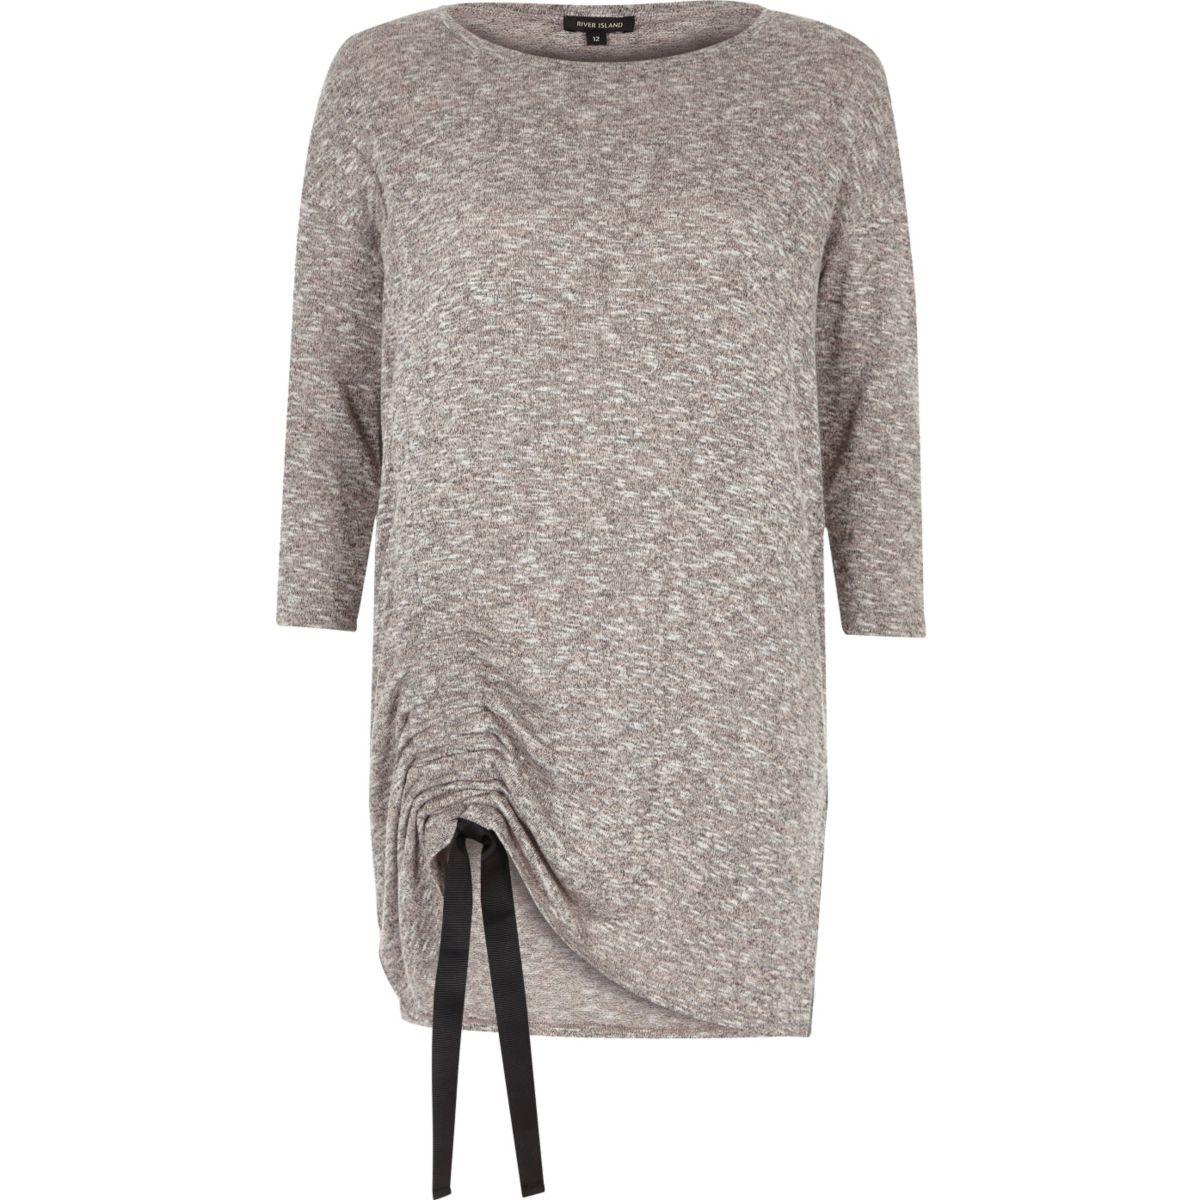 Grey ruched drawstring top